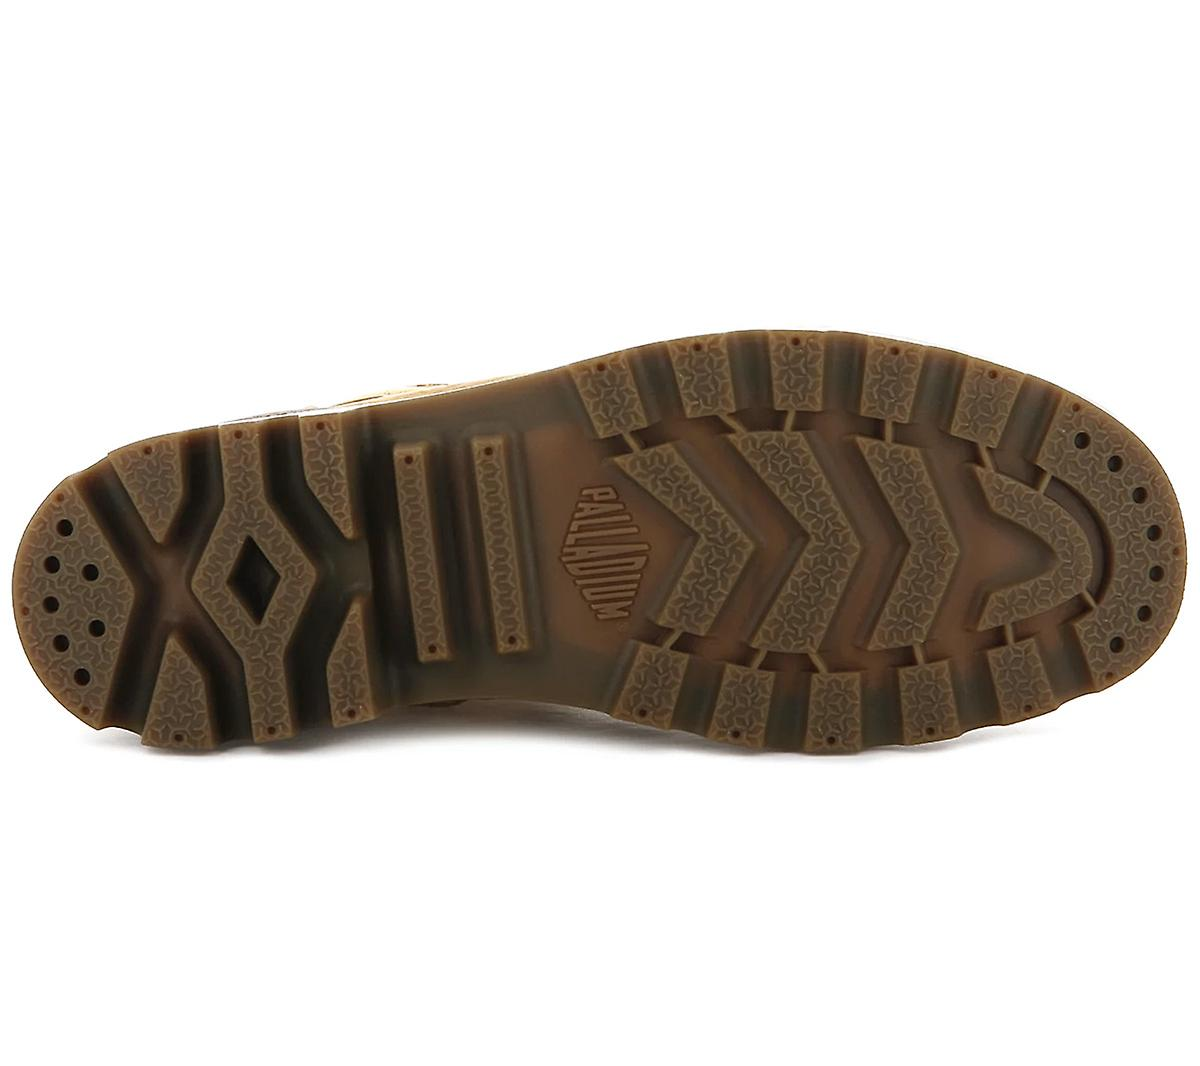 Palladium Pampa Hi Zip WL W 95982-717-M Women's Boots Brown Sneakers Sports Shoes